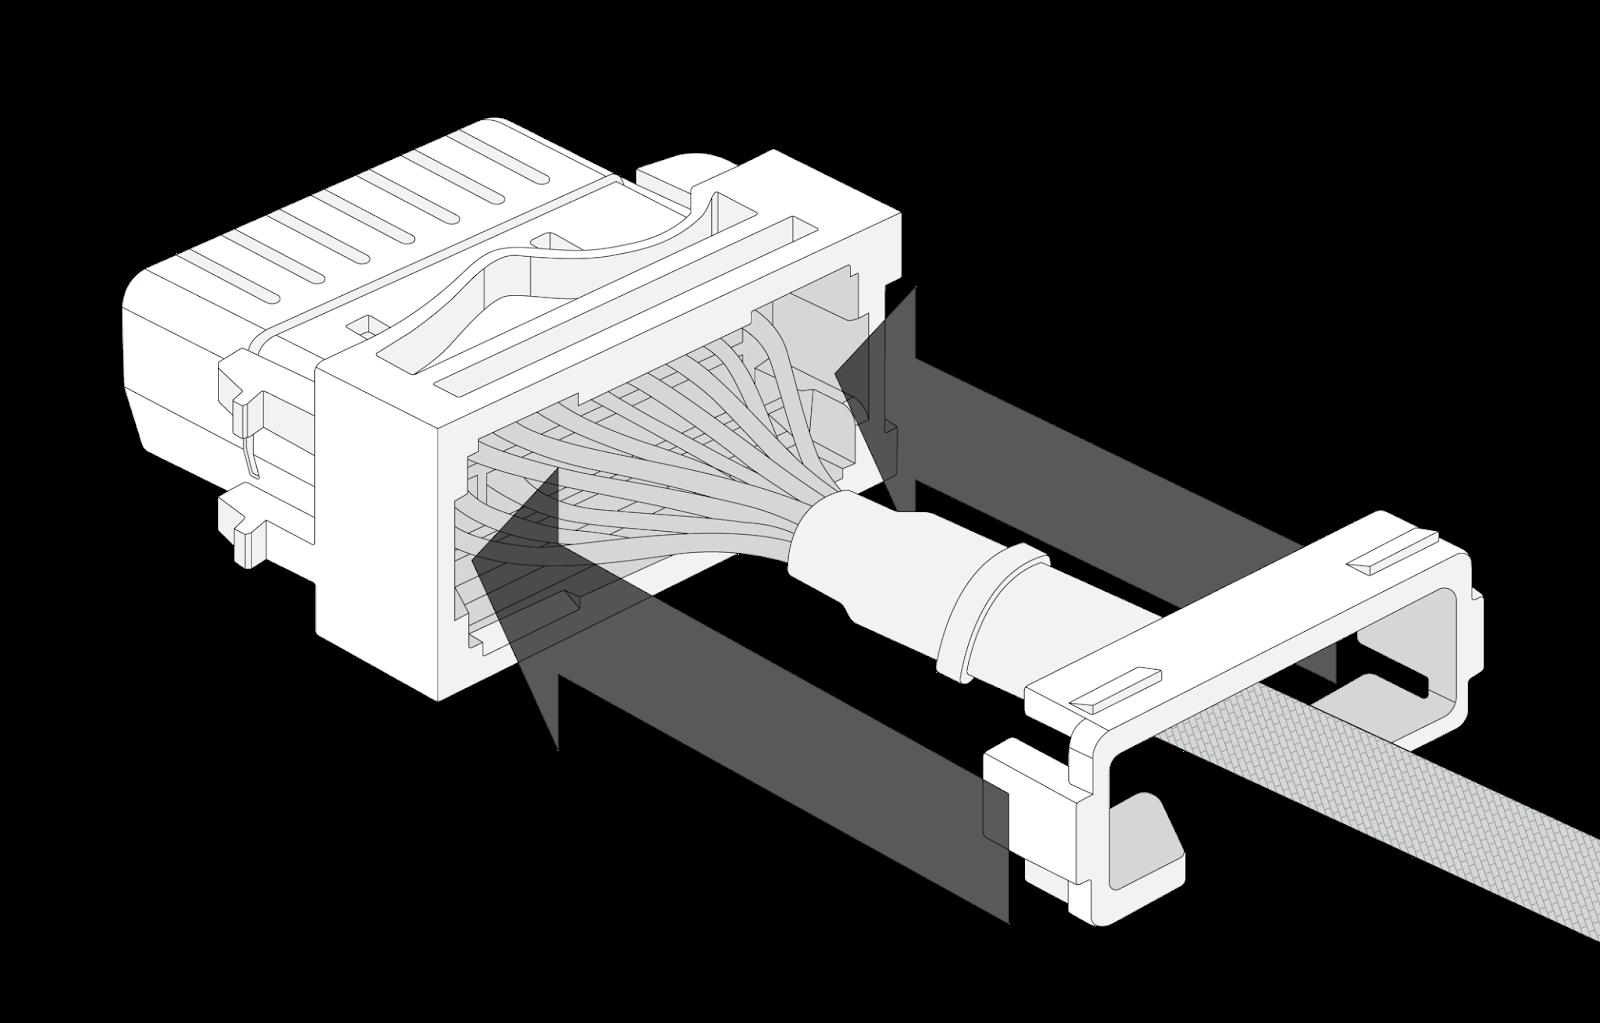 universal-harness-setup-figure13.png